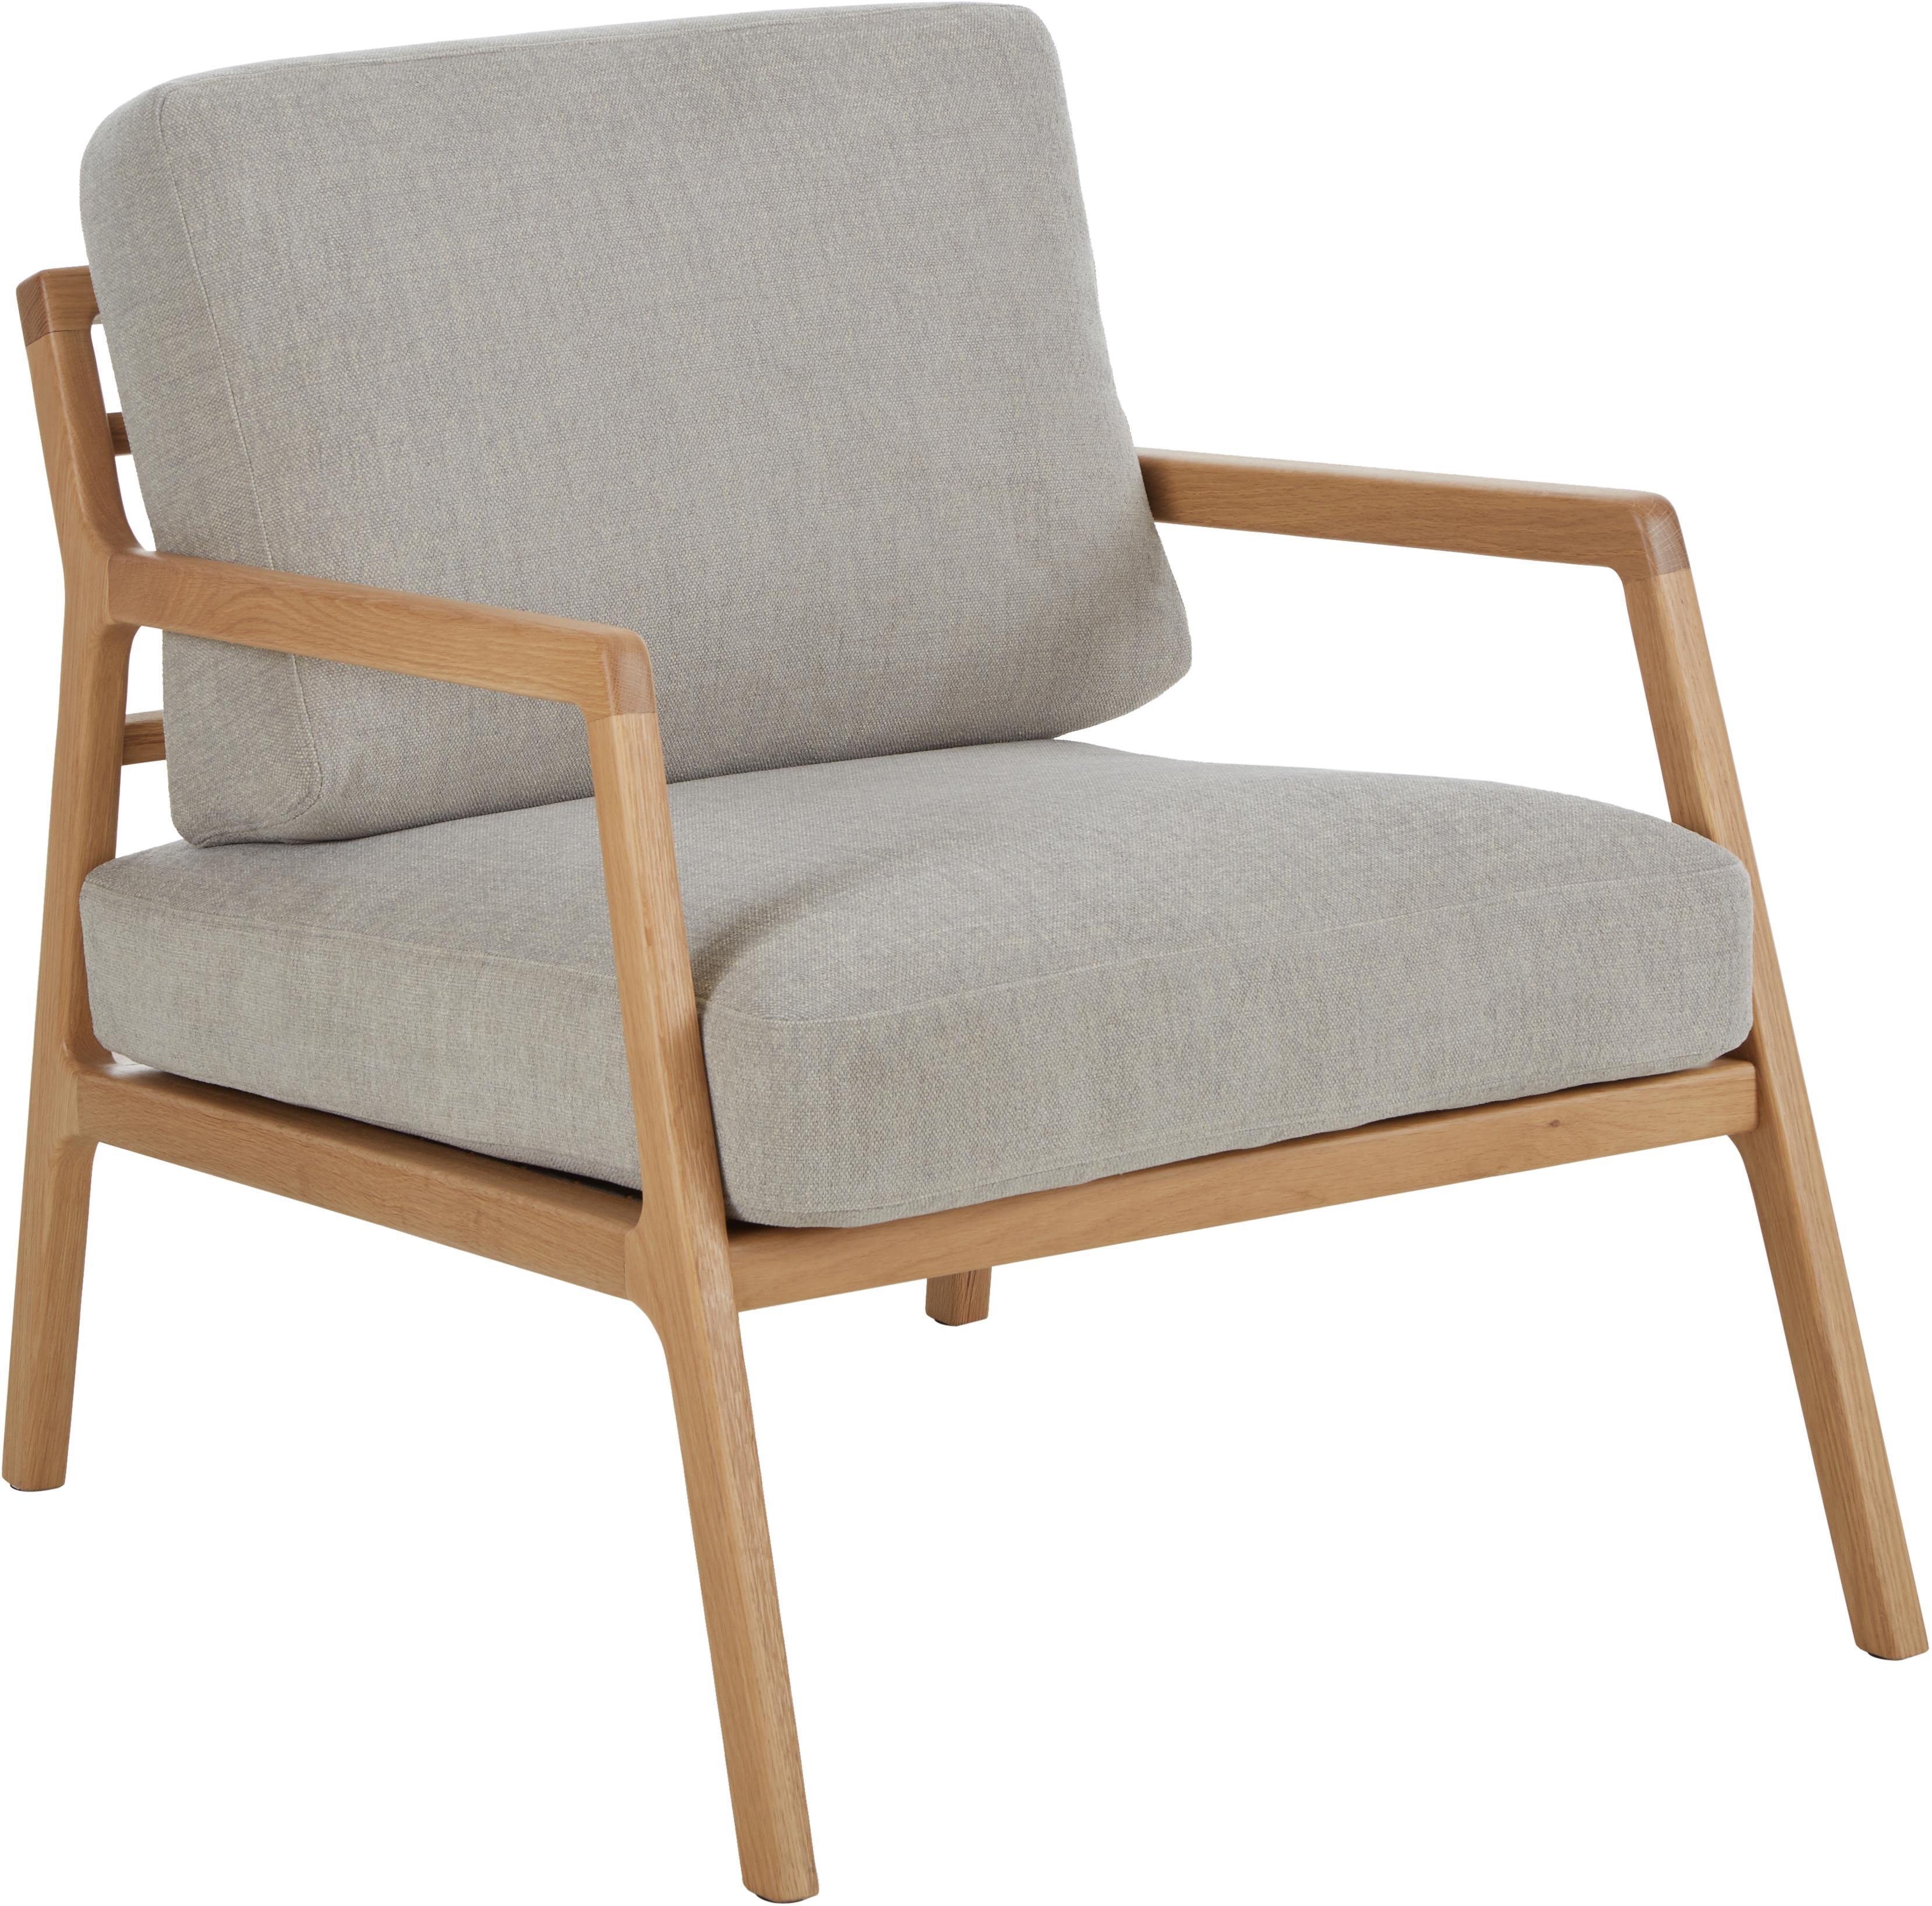 Sessel Becky mit Armlehnen aus Eichenholz, Bezug: Polyester 35.000 Scheuert, Gestell: Massives Eichenholz, Webstoff Grau, B 73 x T 90 cm